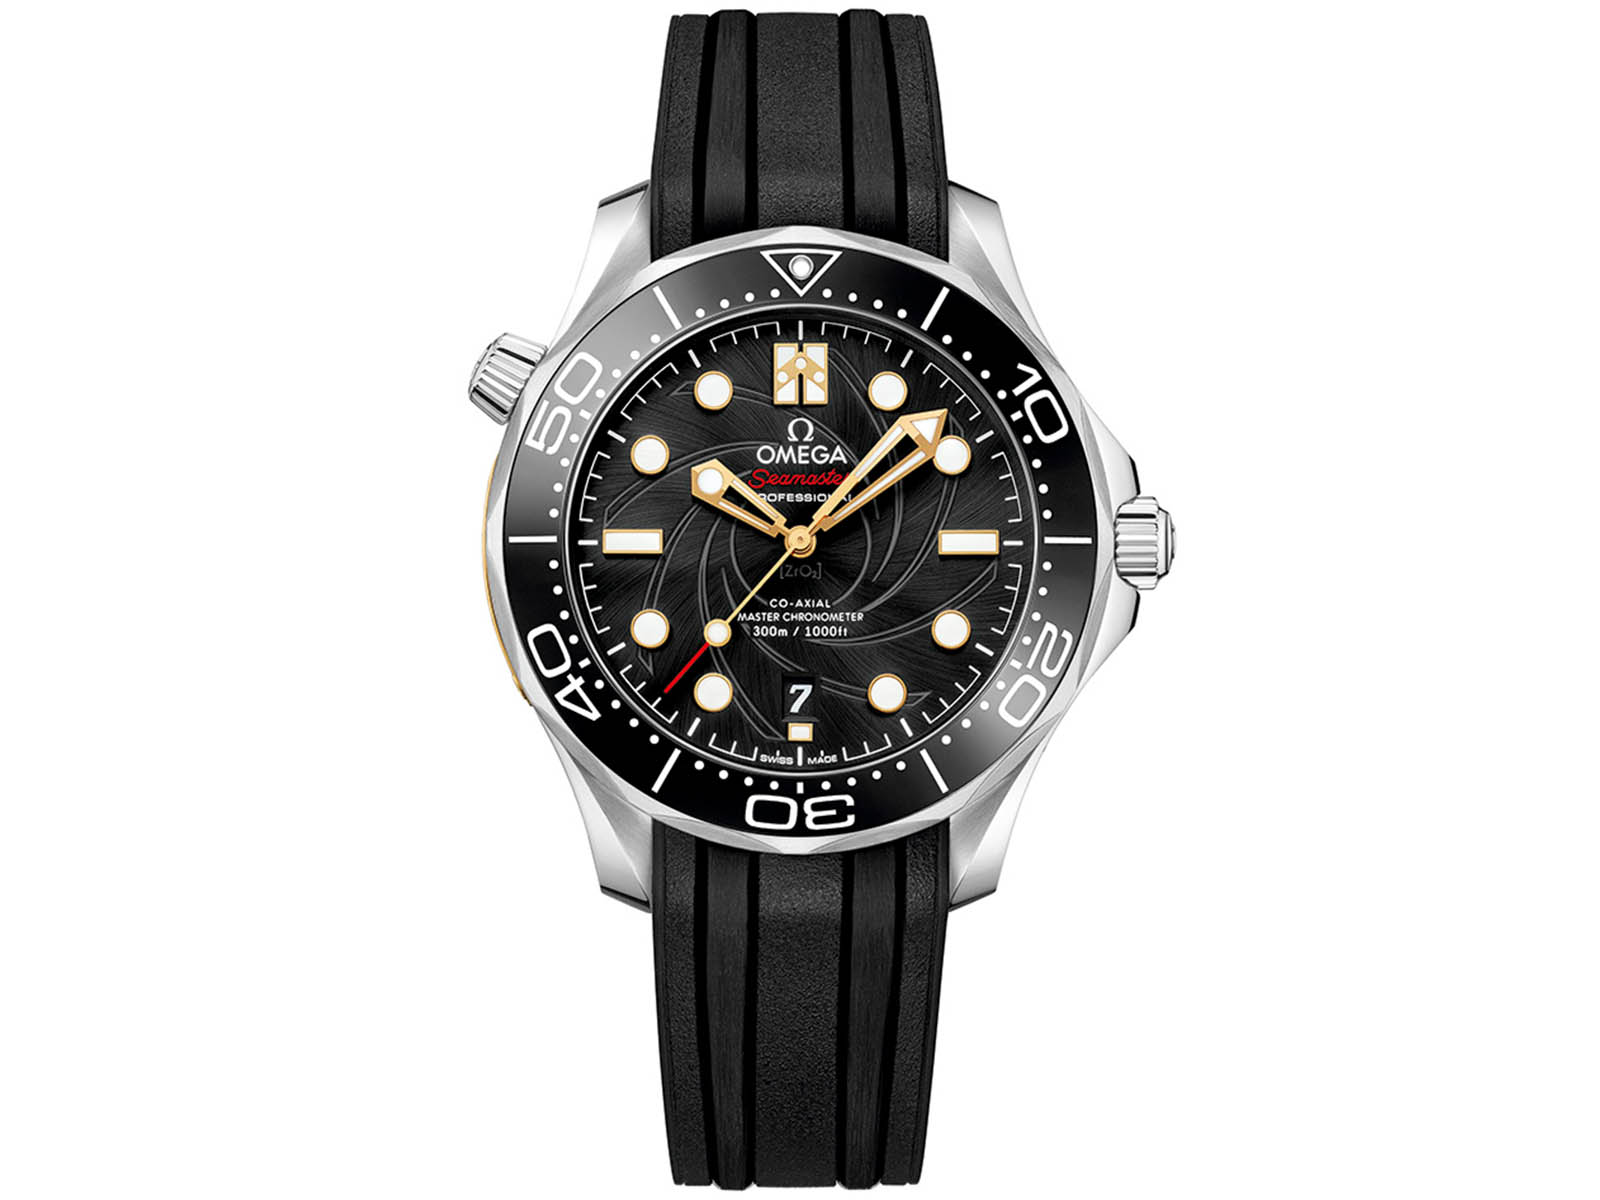 210-22-42-20-01-004-omega-seamaster-300m-diver-007-4-.jpg